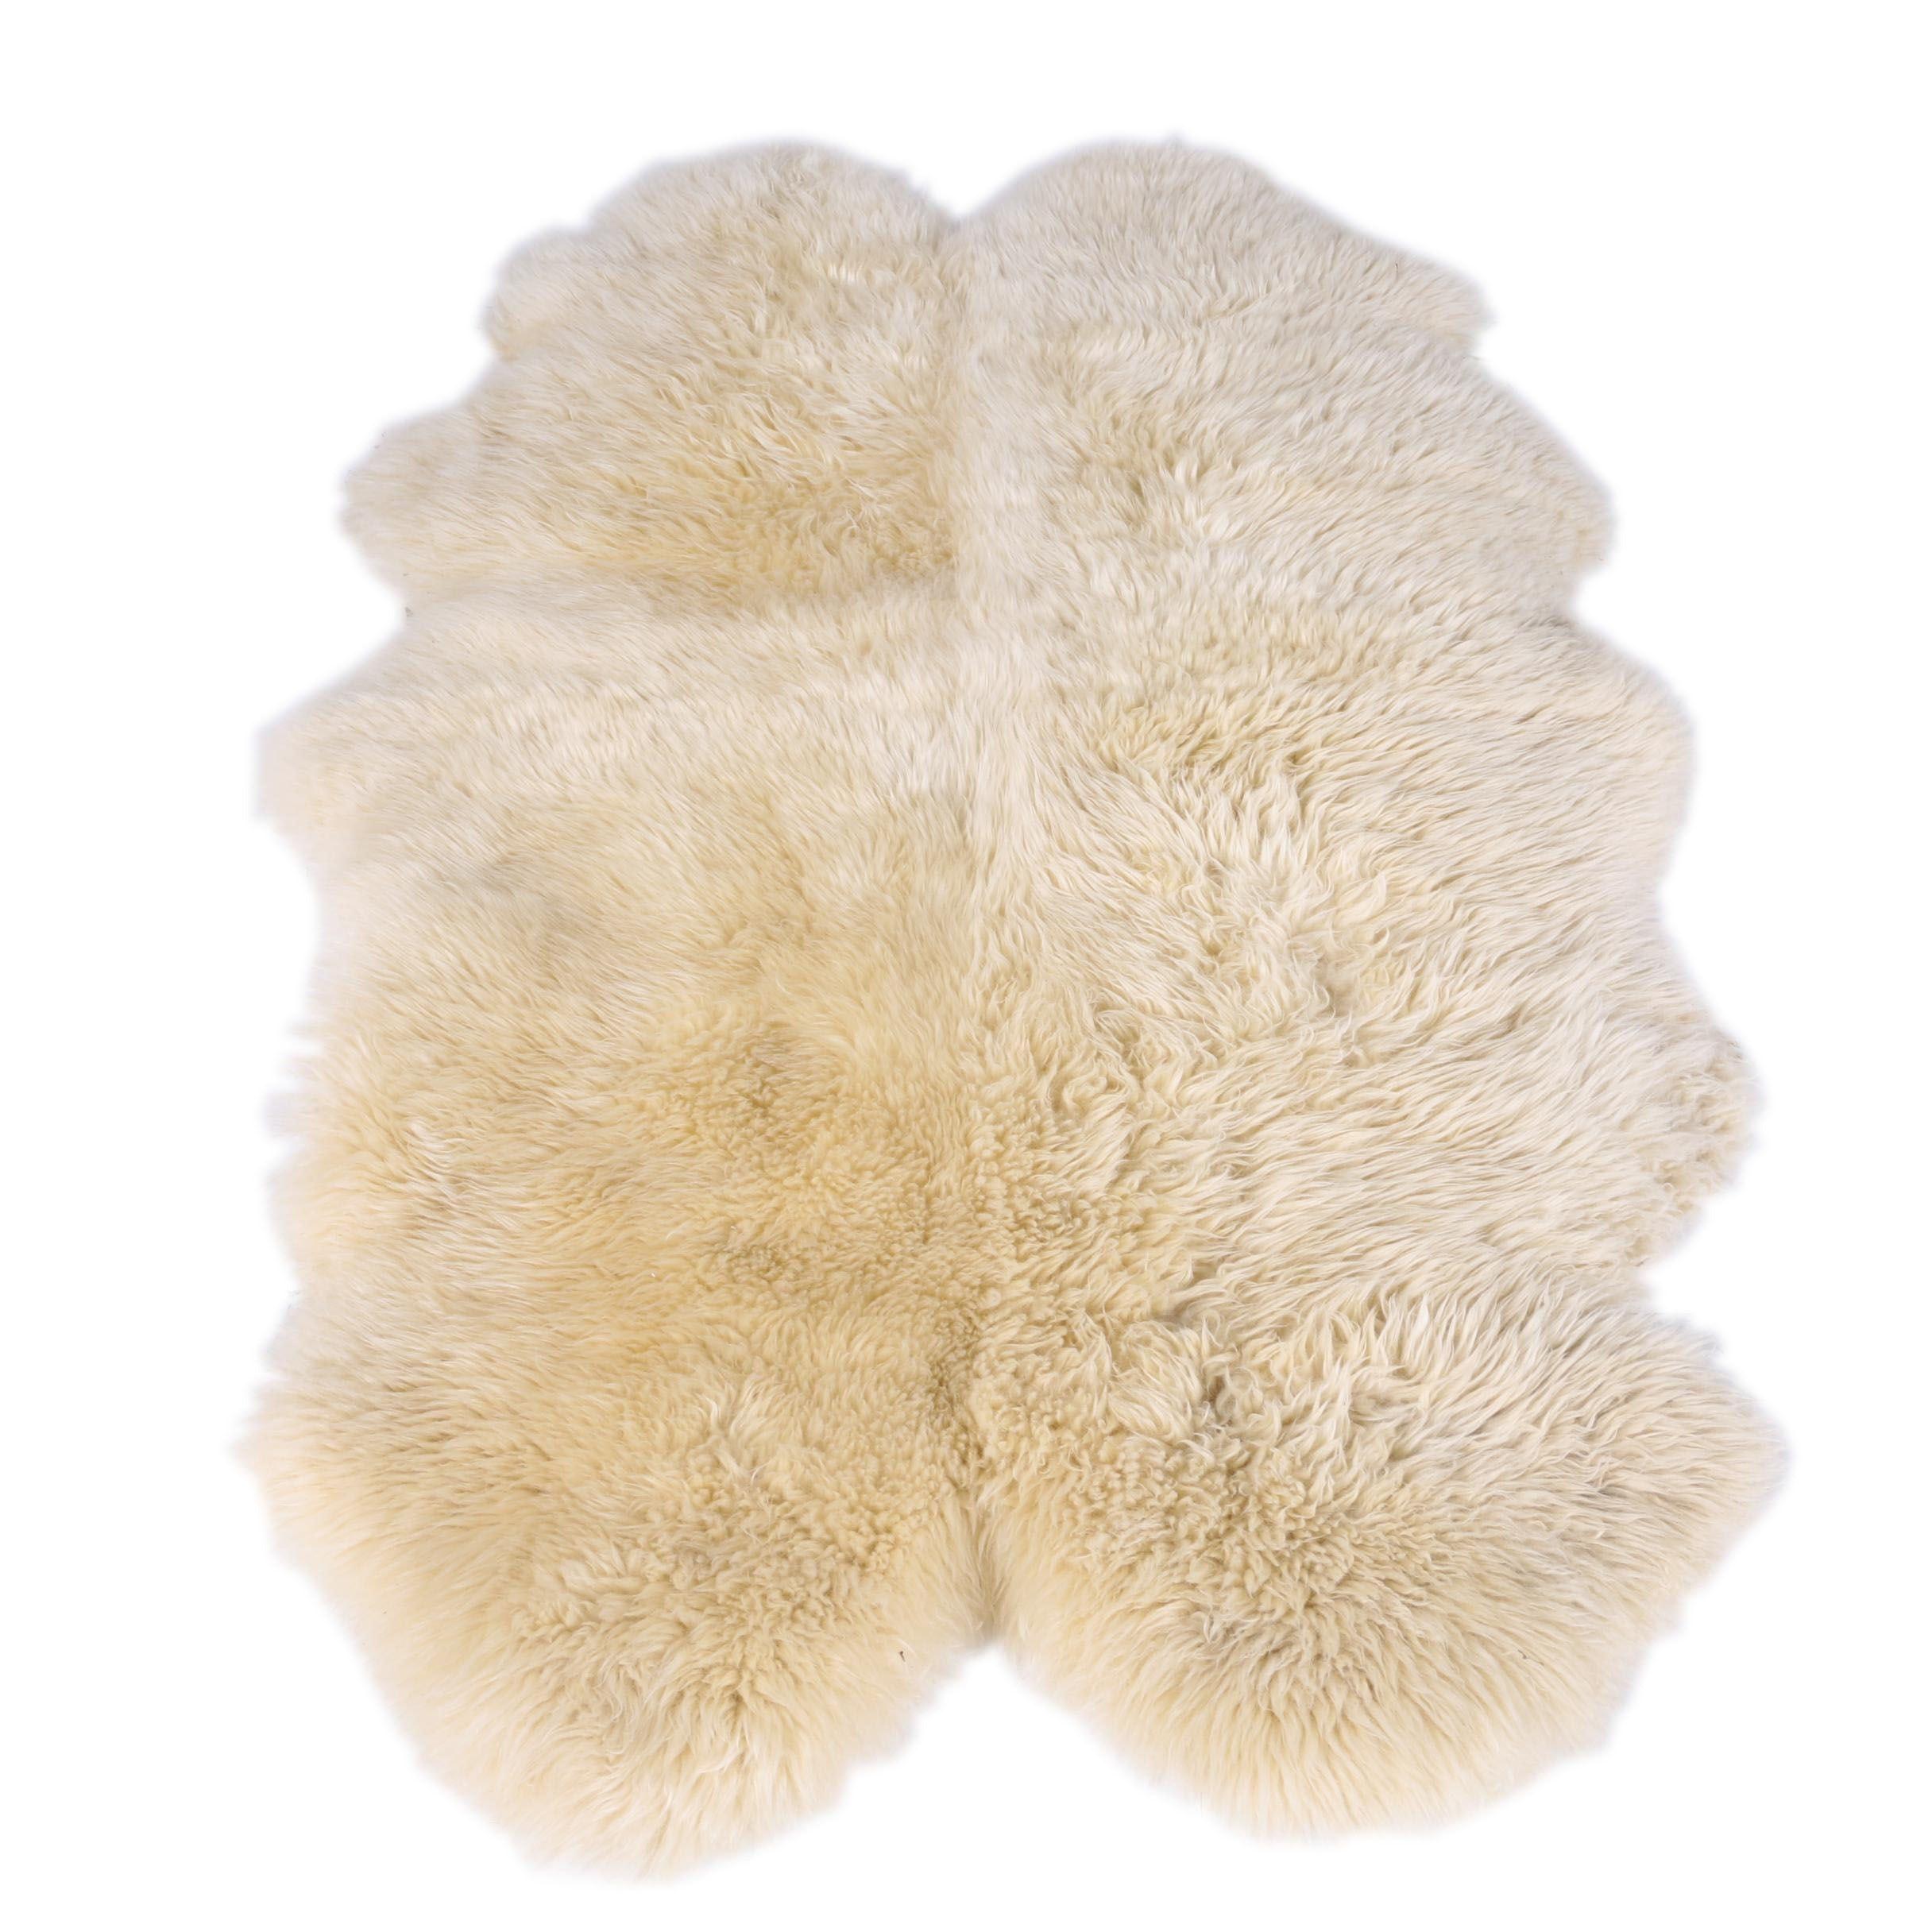 Natural Sheepskin Accent Rug by Windward